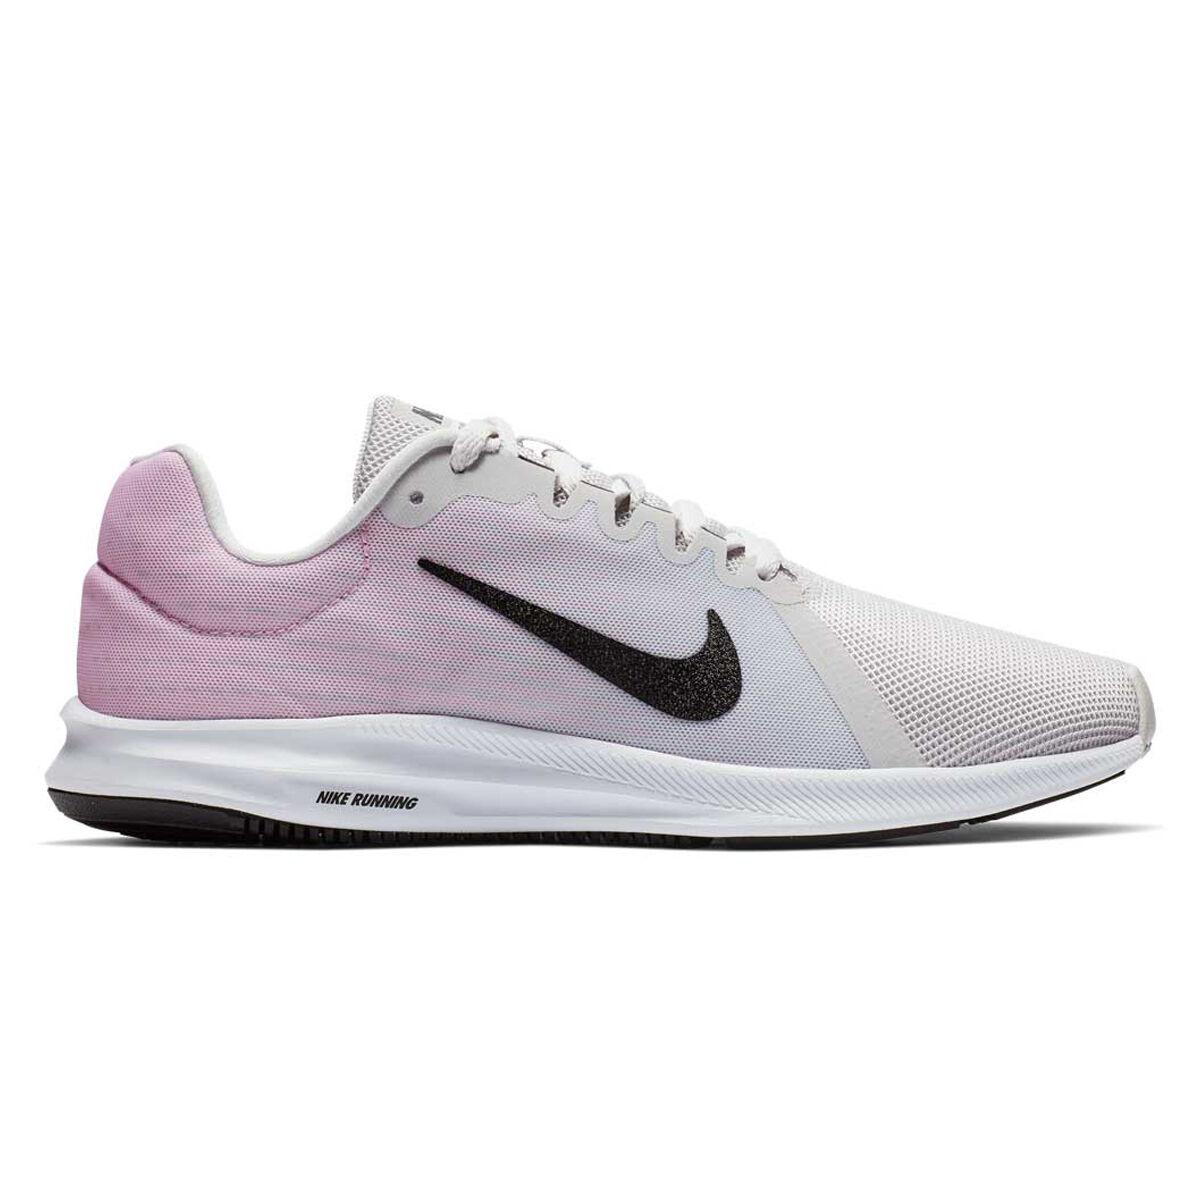 Nike Downshifter 8 Womens Running Shoes